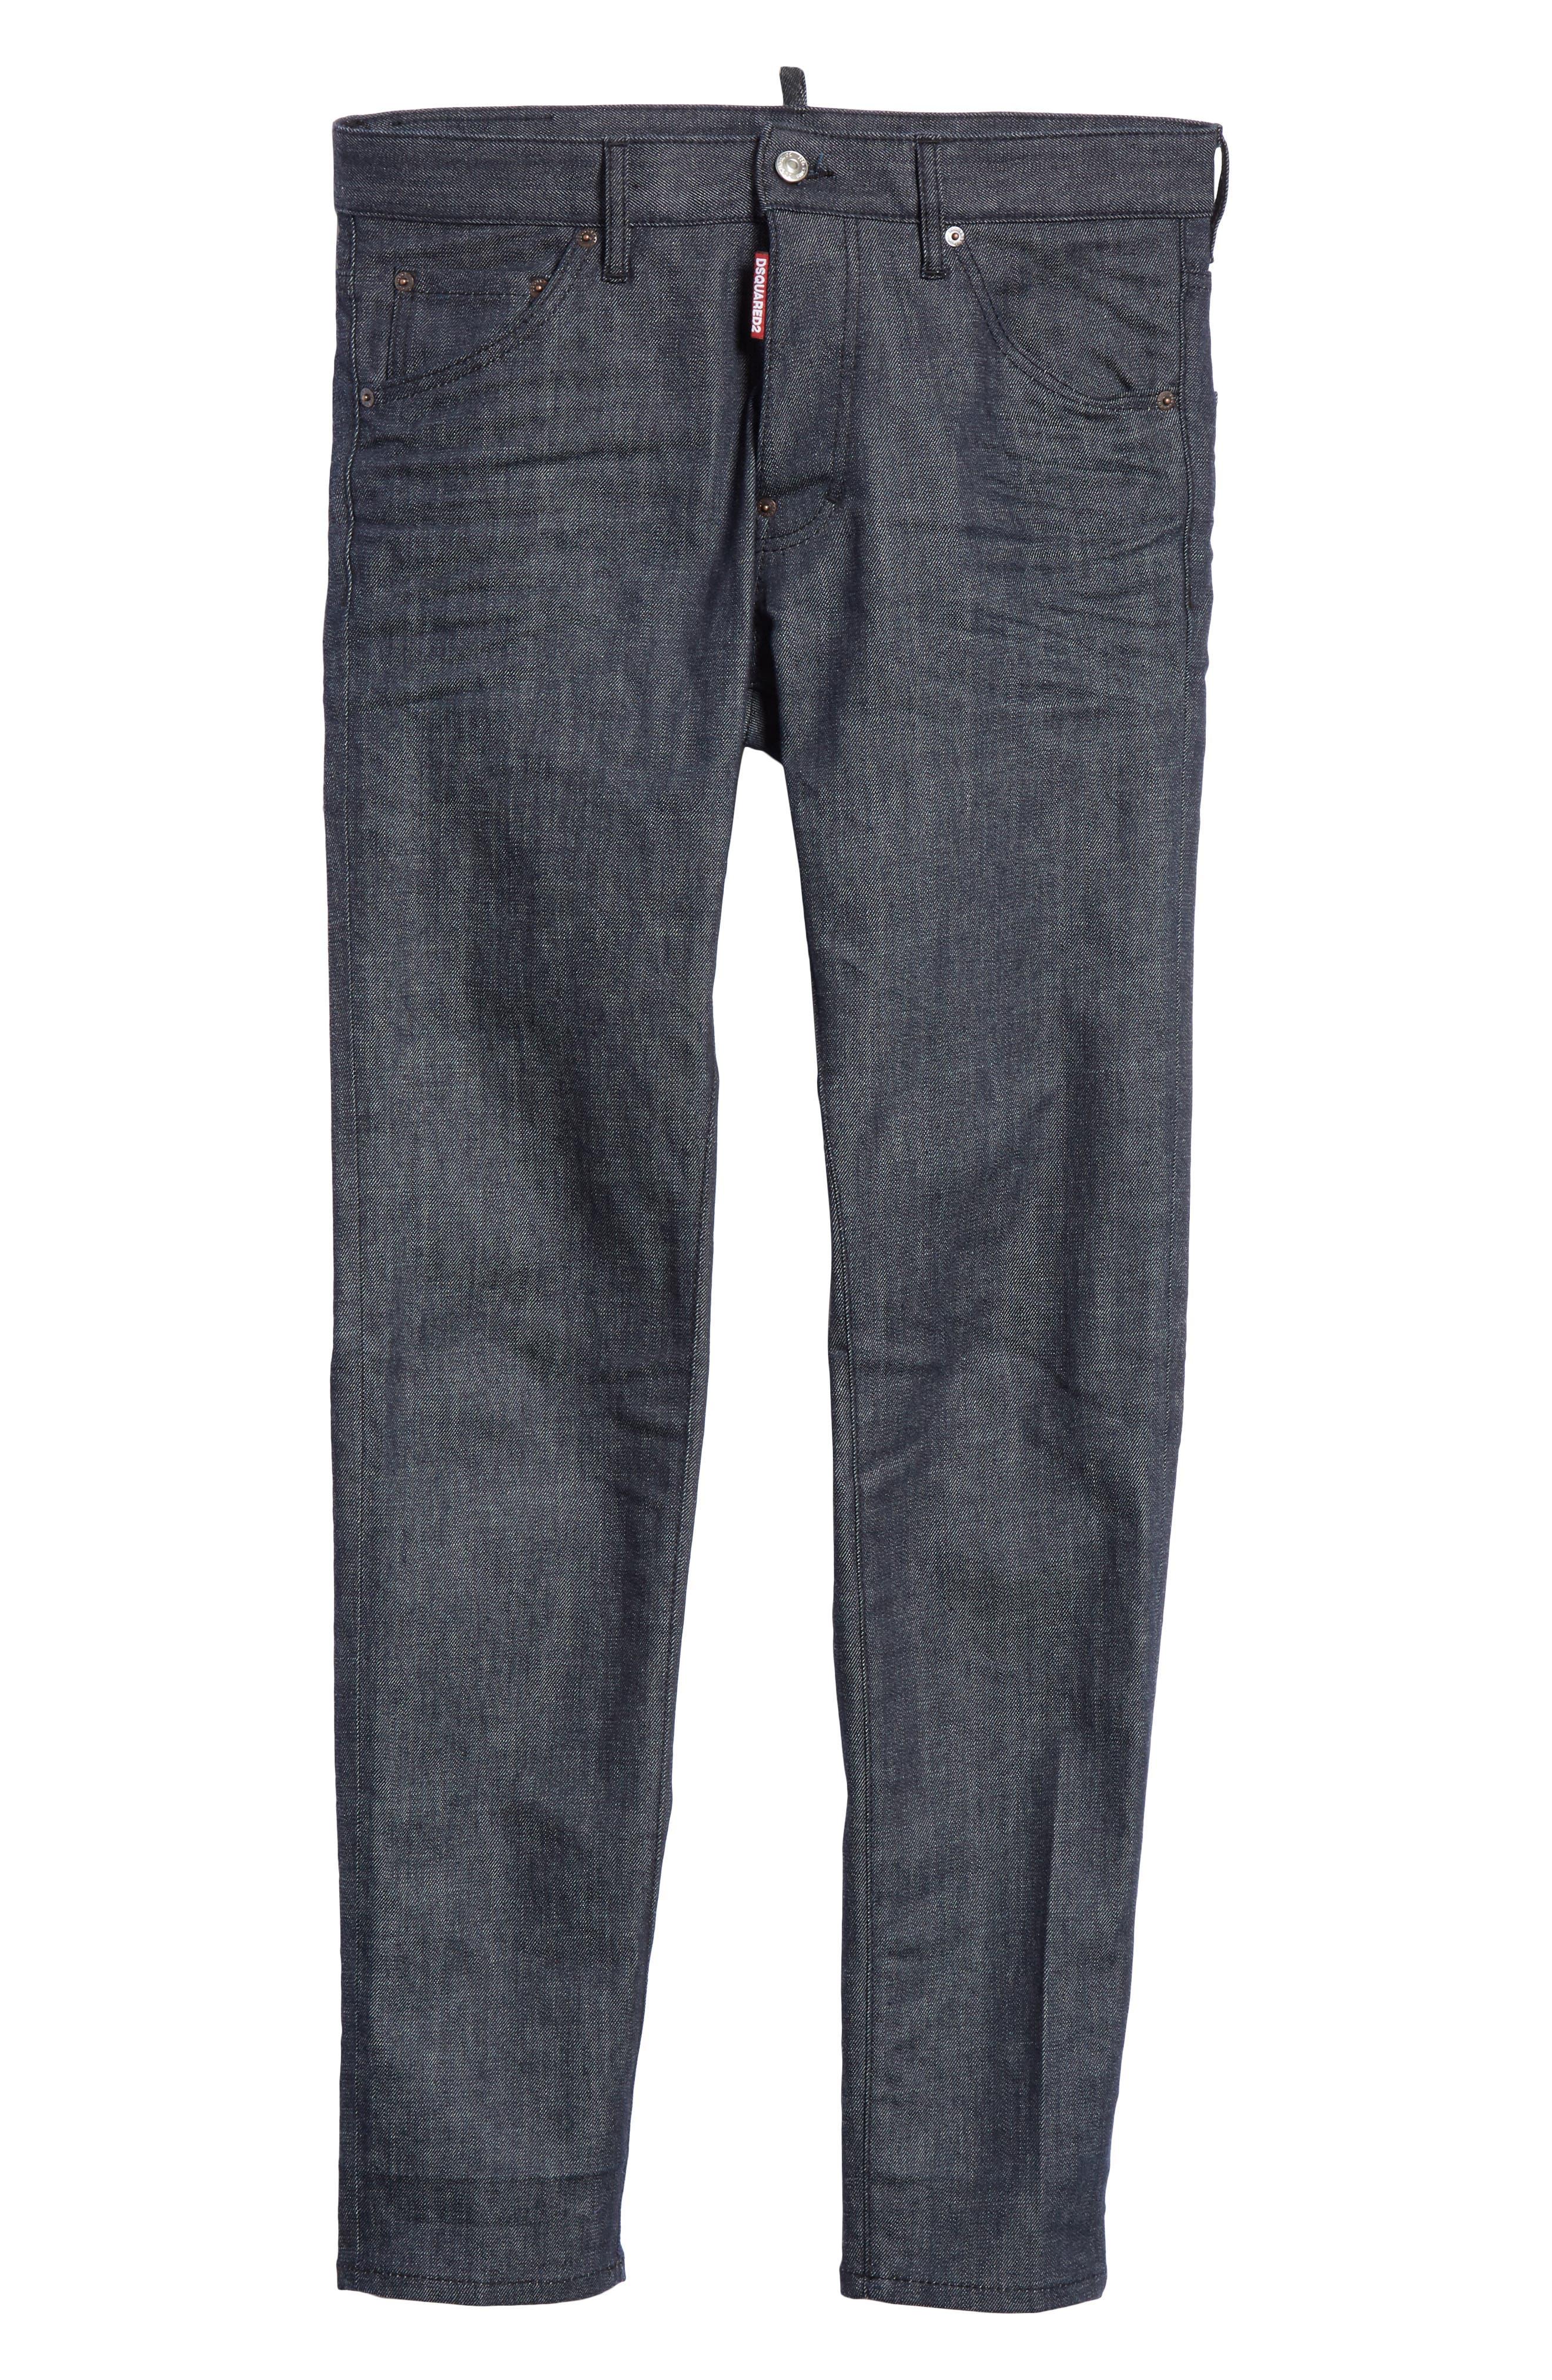 Cool Guy Jeans,                             Alternate thumbnail 6, color,                             DARK WASH